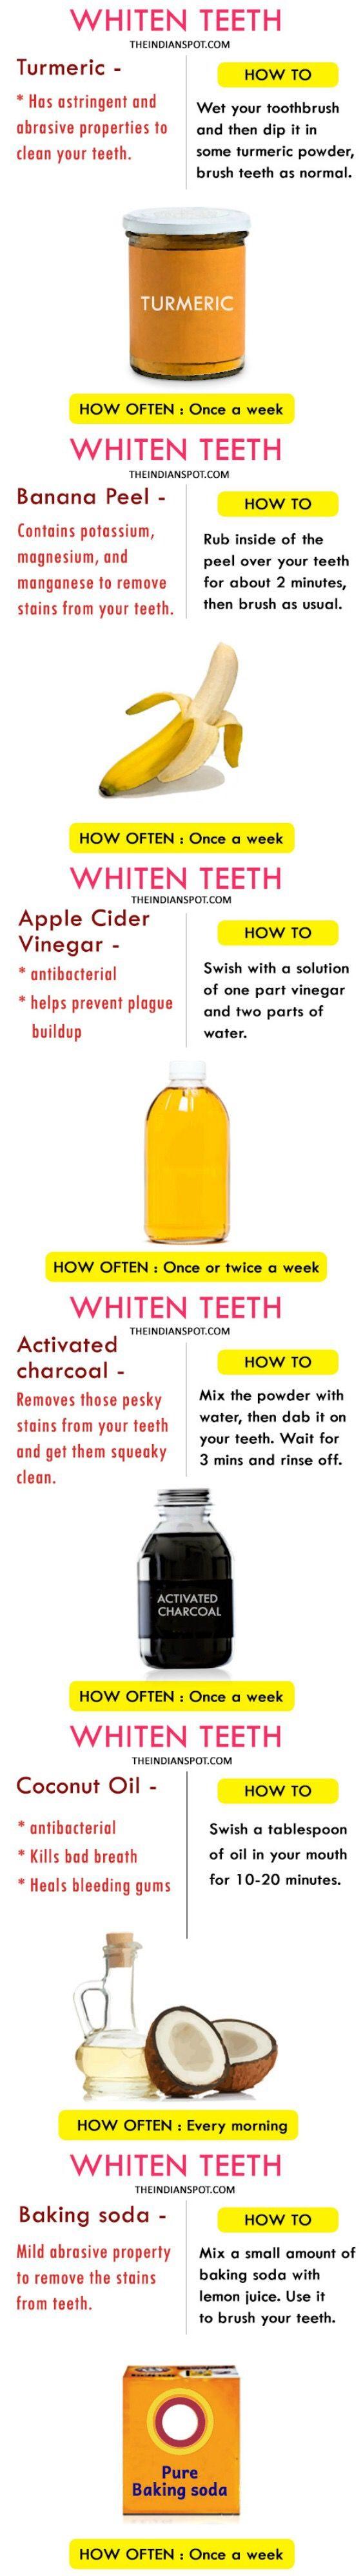 Whiten teeth naturally